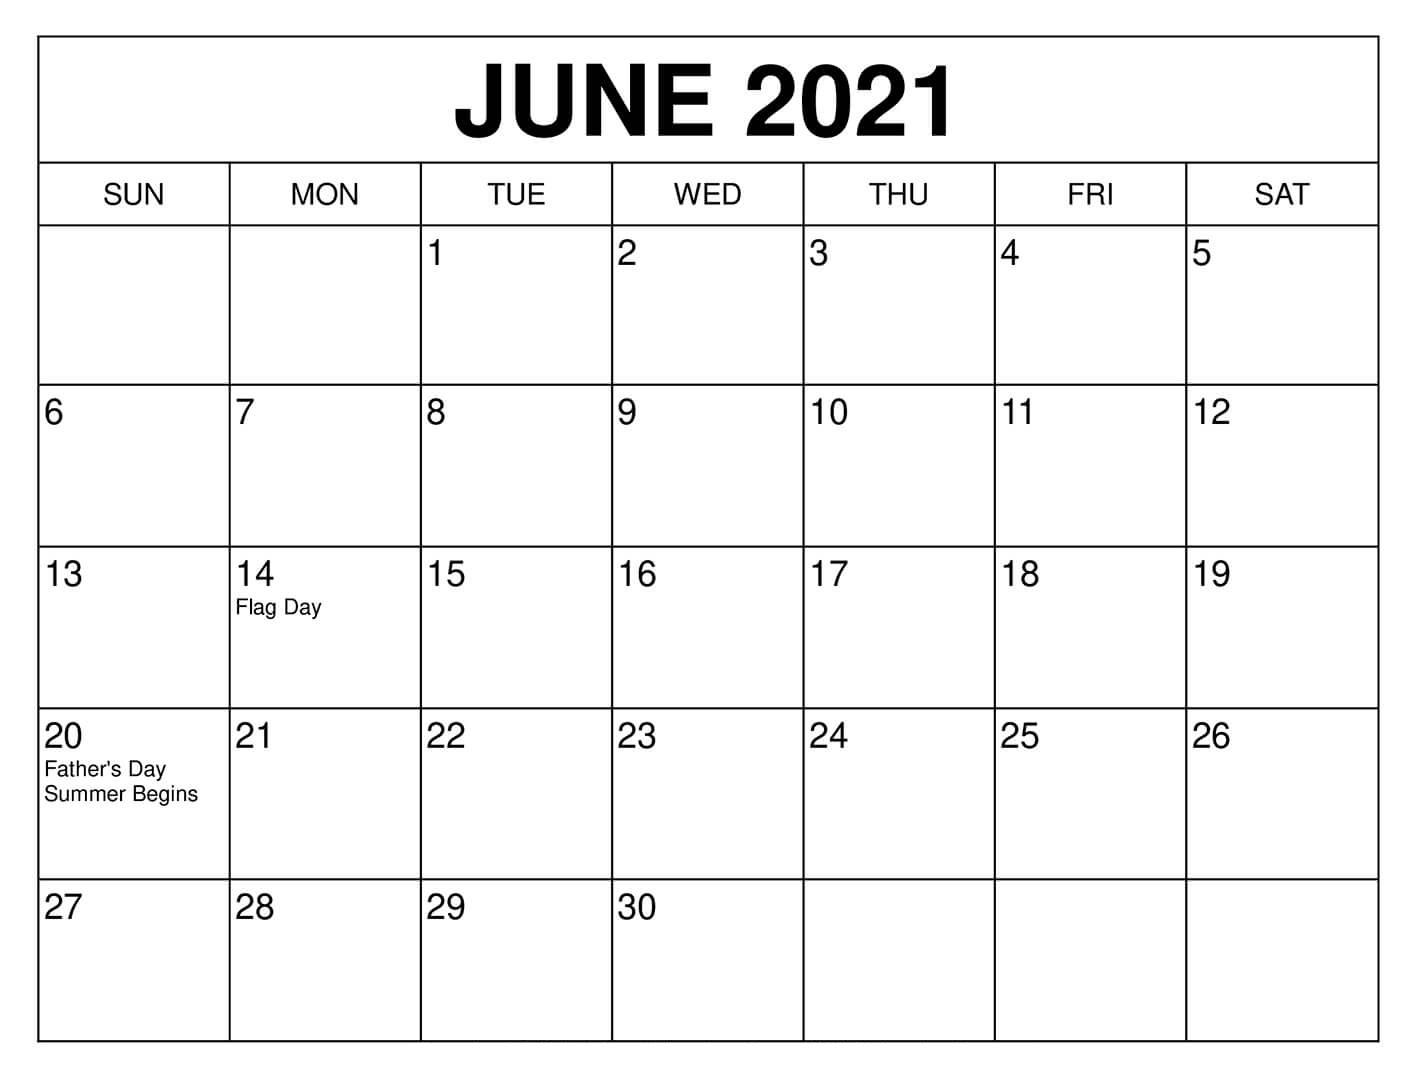 Free June 2021 Calendar With Holidays - Thecalendarpedia